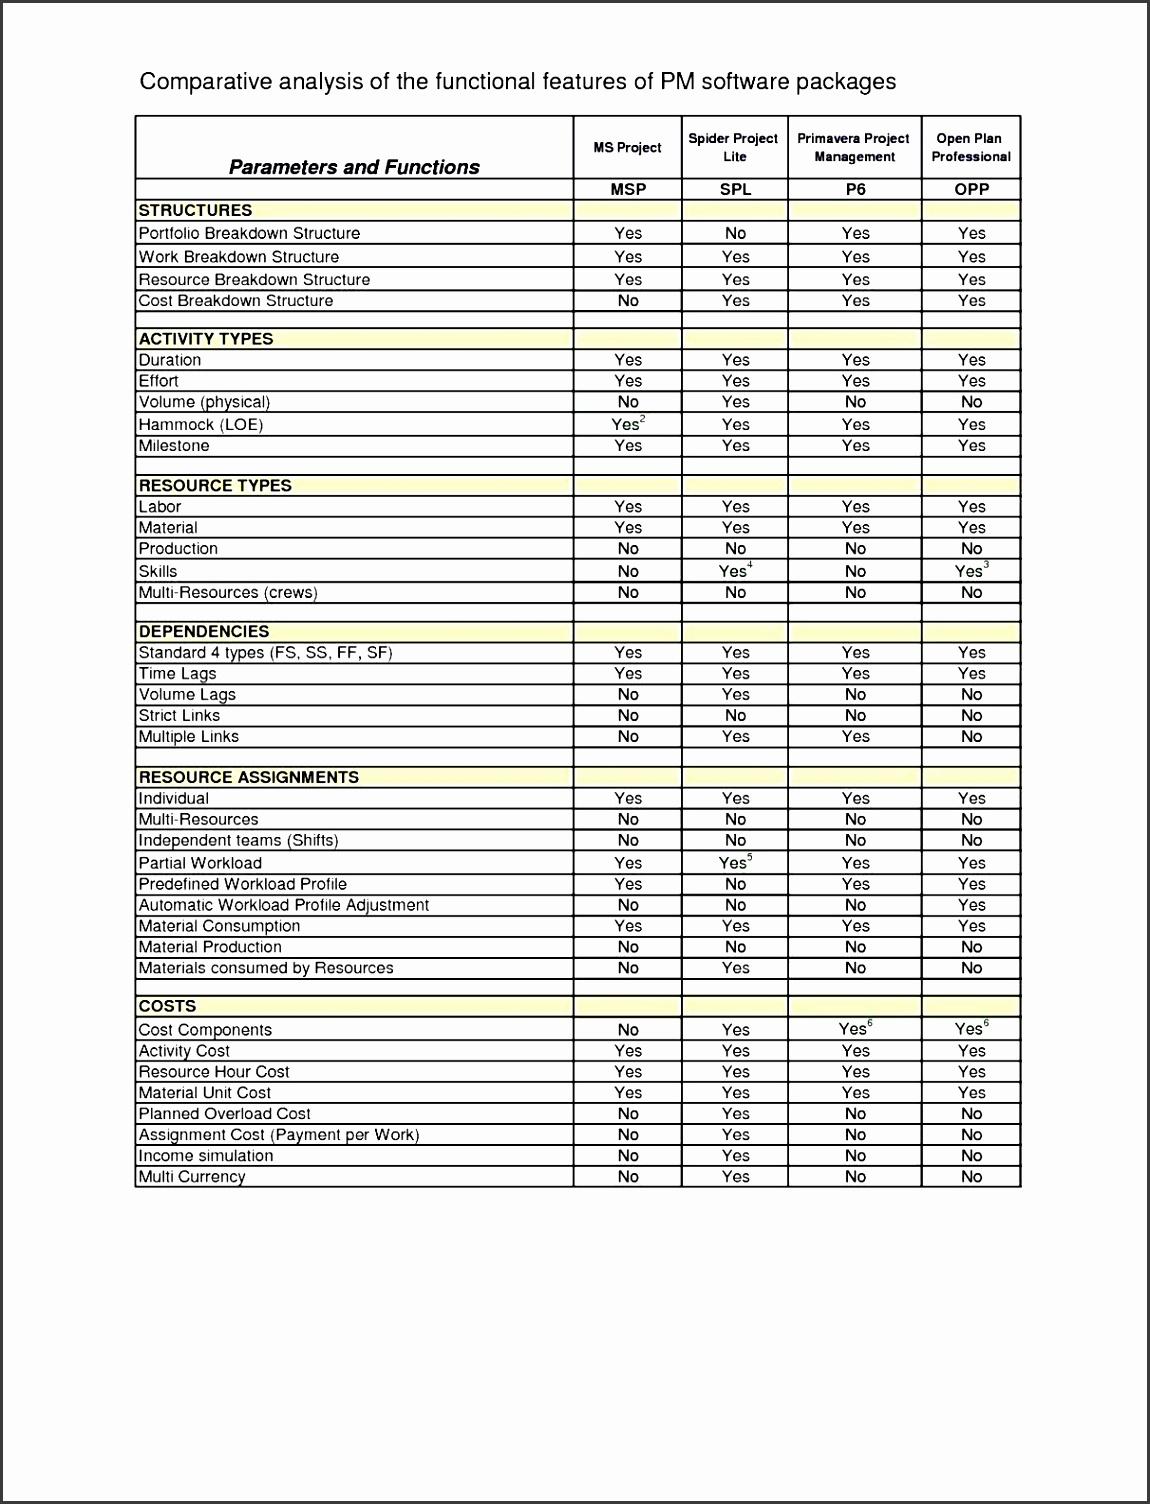 8 Impact assessment Template Excel - SampleTemplatess ...